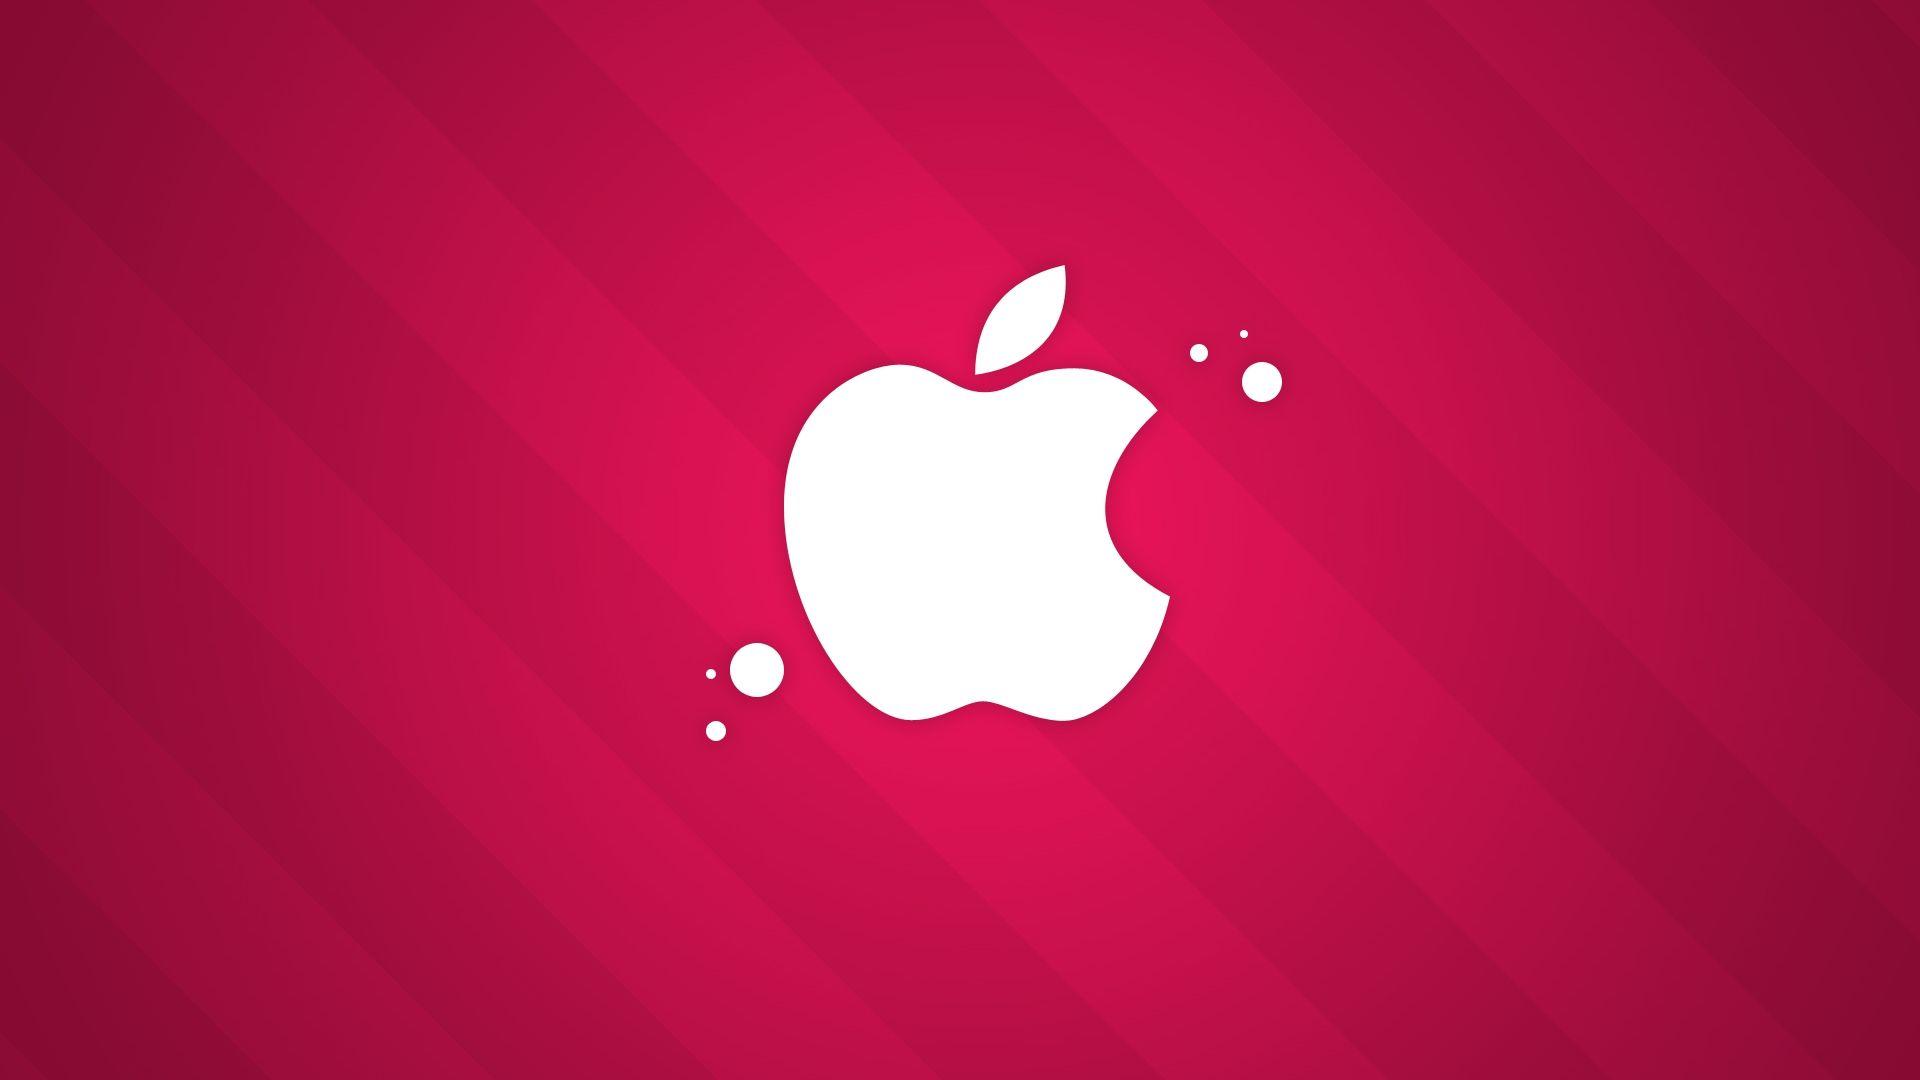 Apple Ipad wallpaper picture